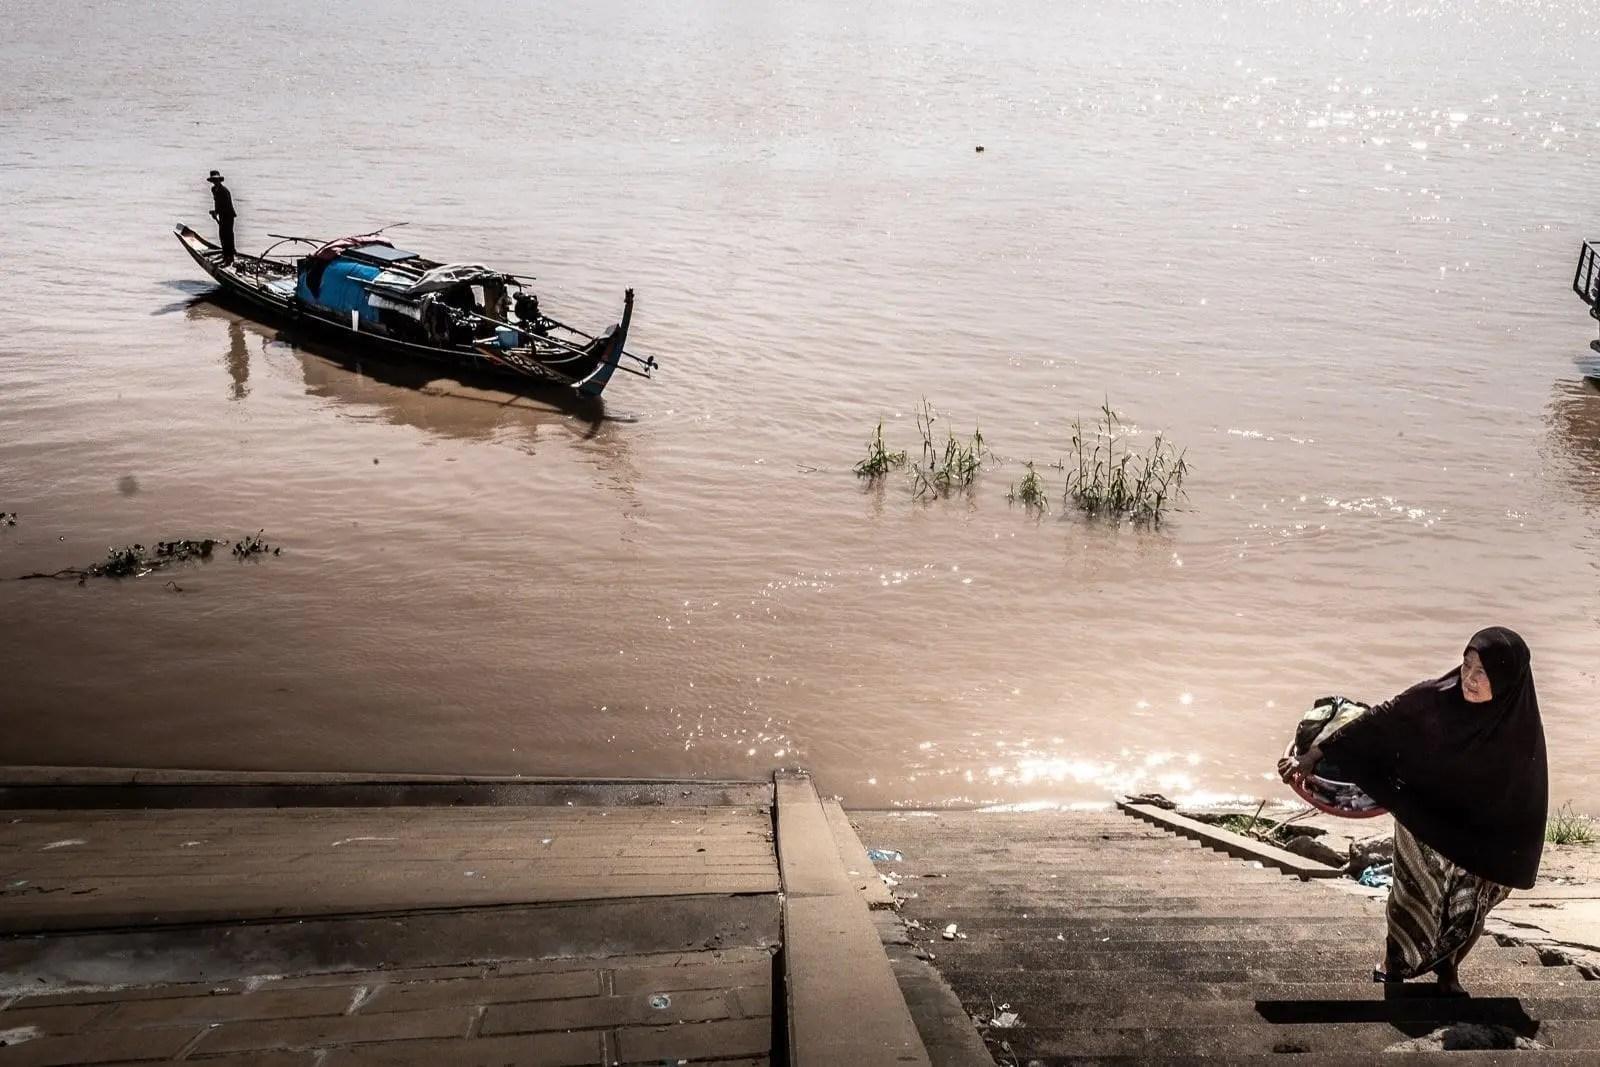 Mekong River | © Gabriele Orlini, 2019